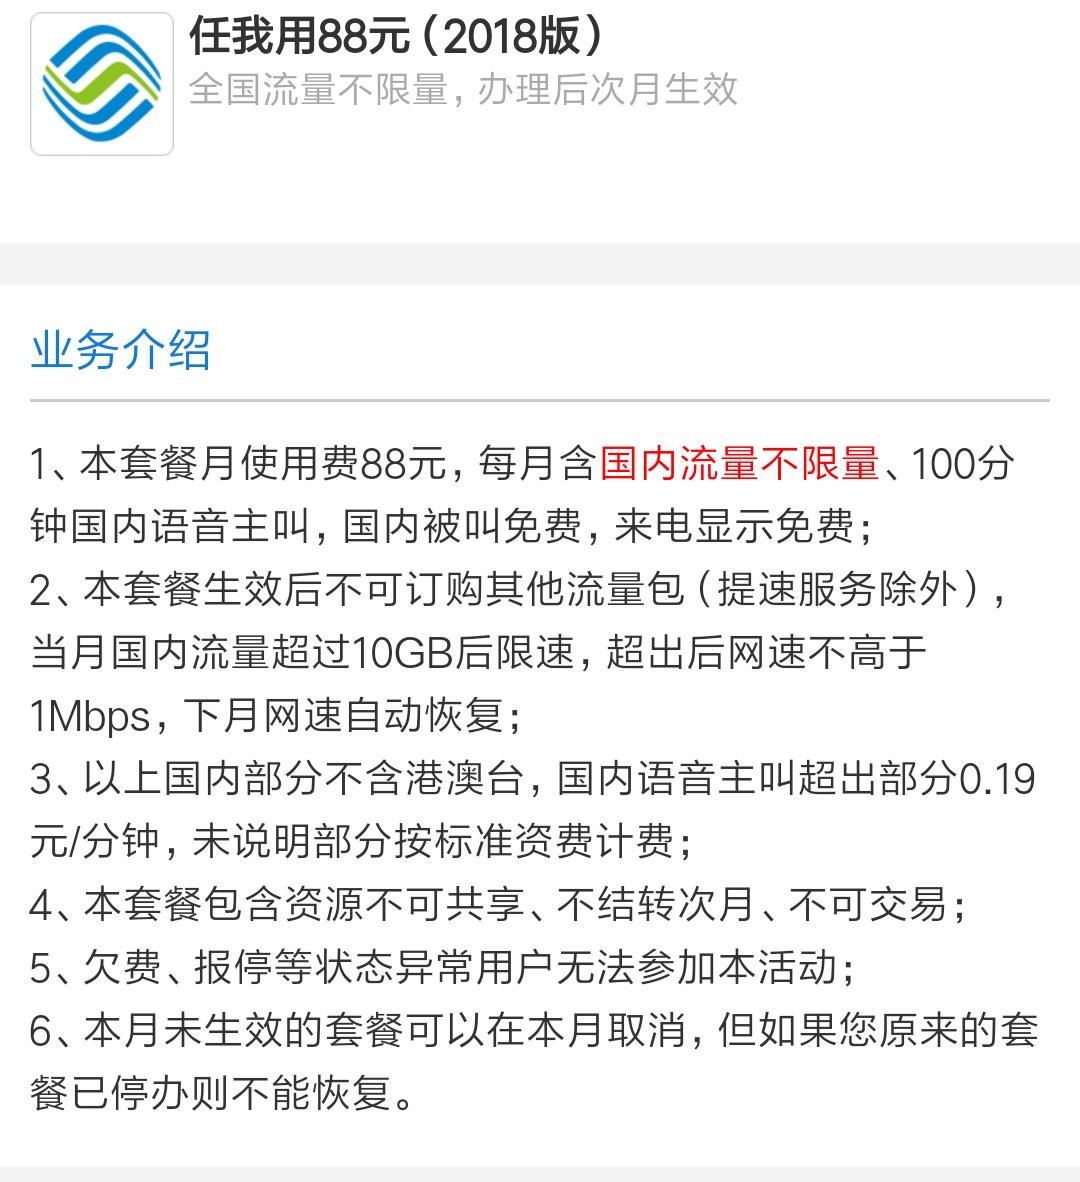 Screenshot_2018-06-11-01-26-01-518_com.sitech.ac.png